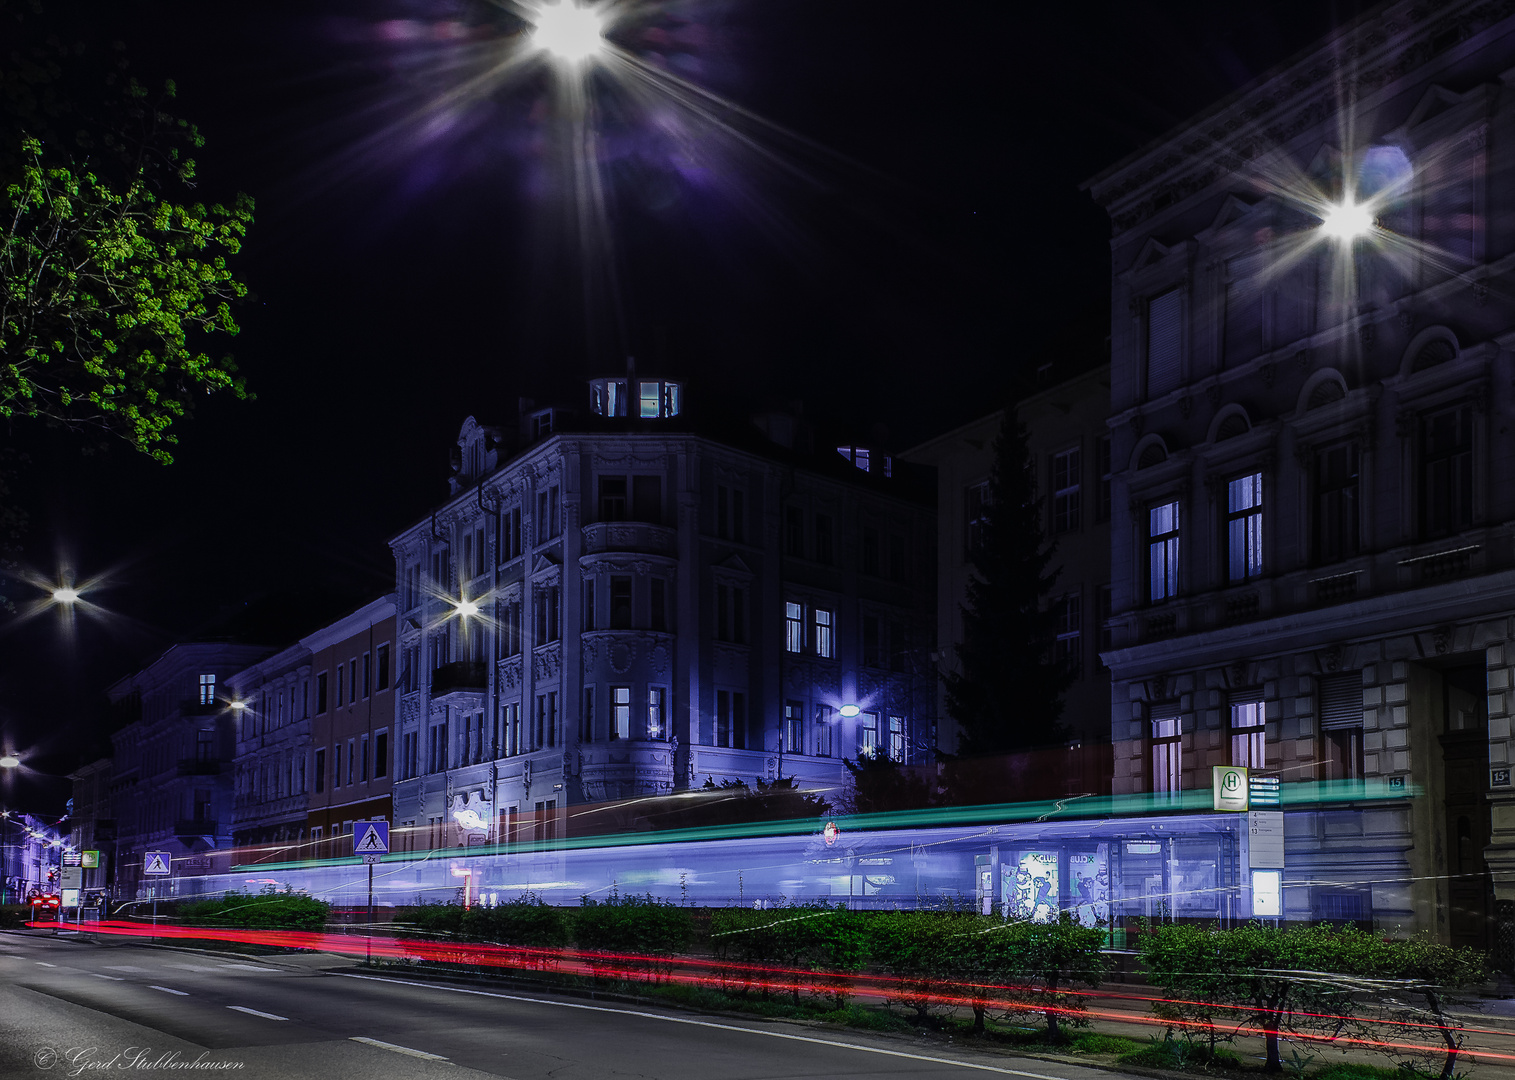 Night in the cityy